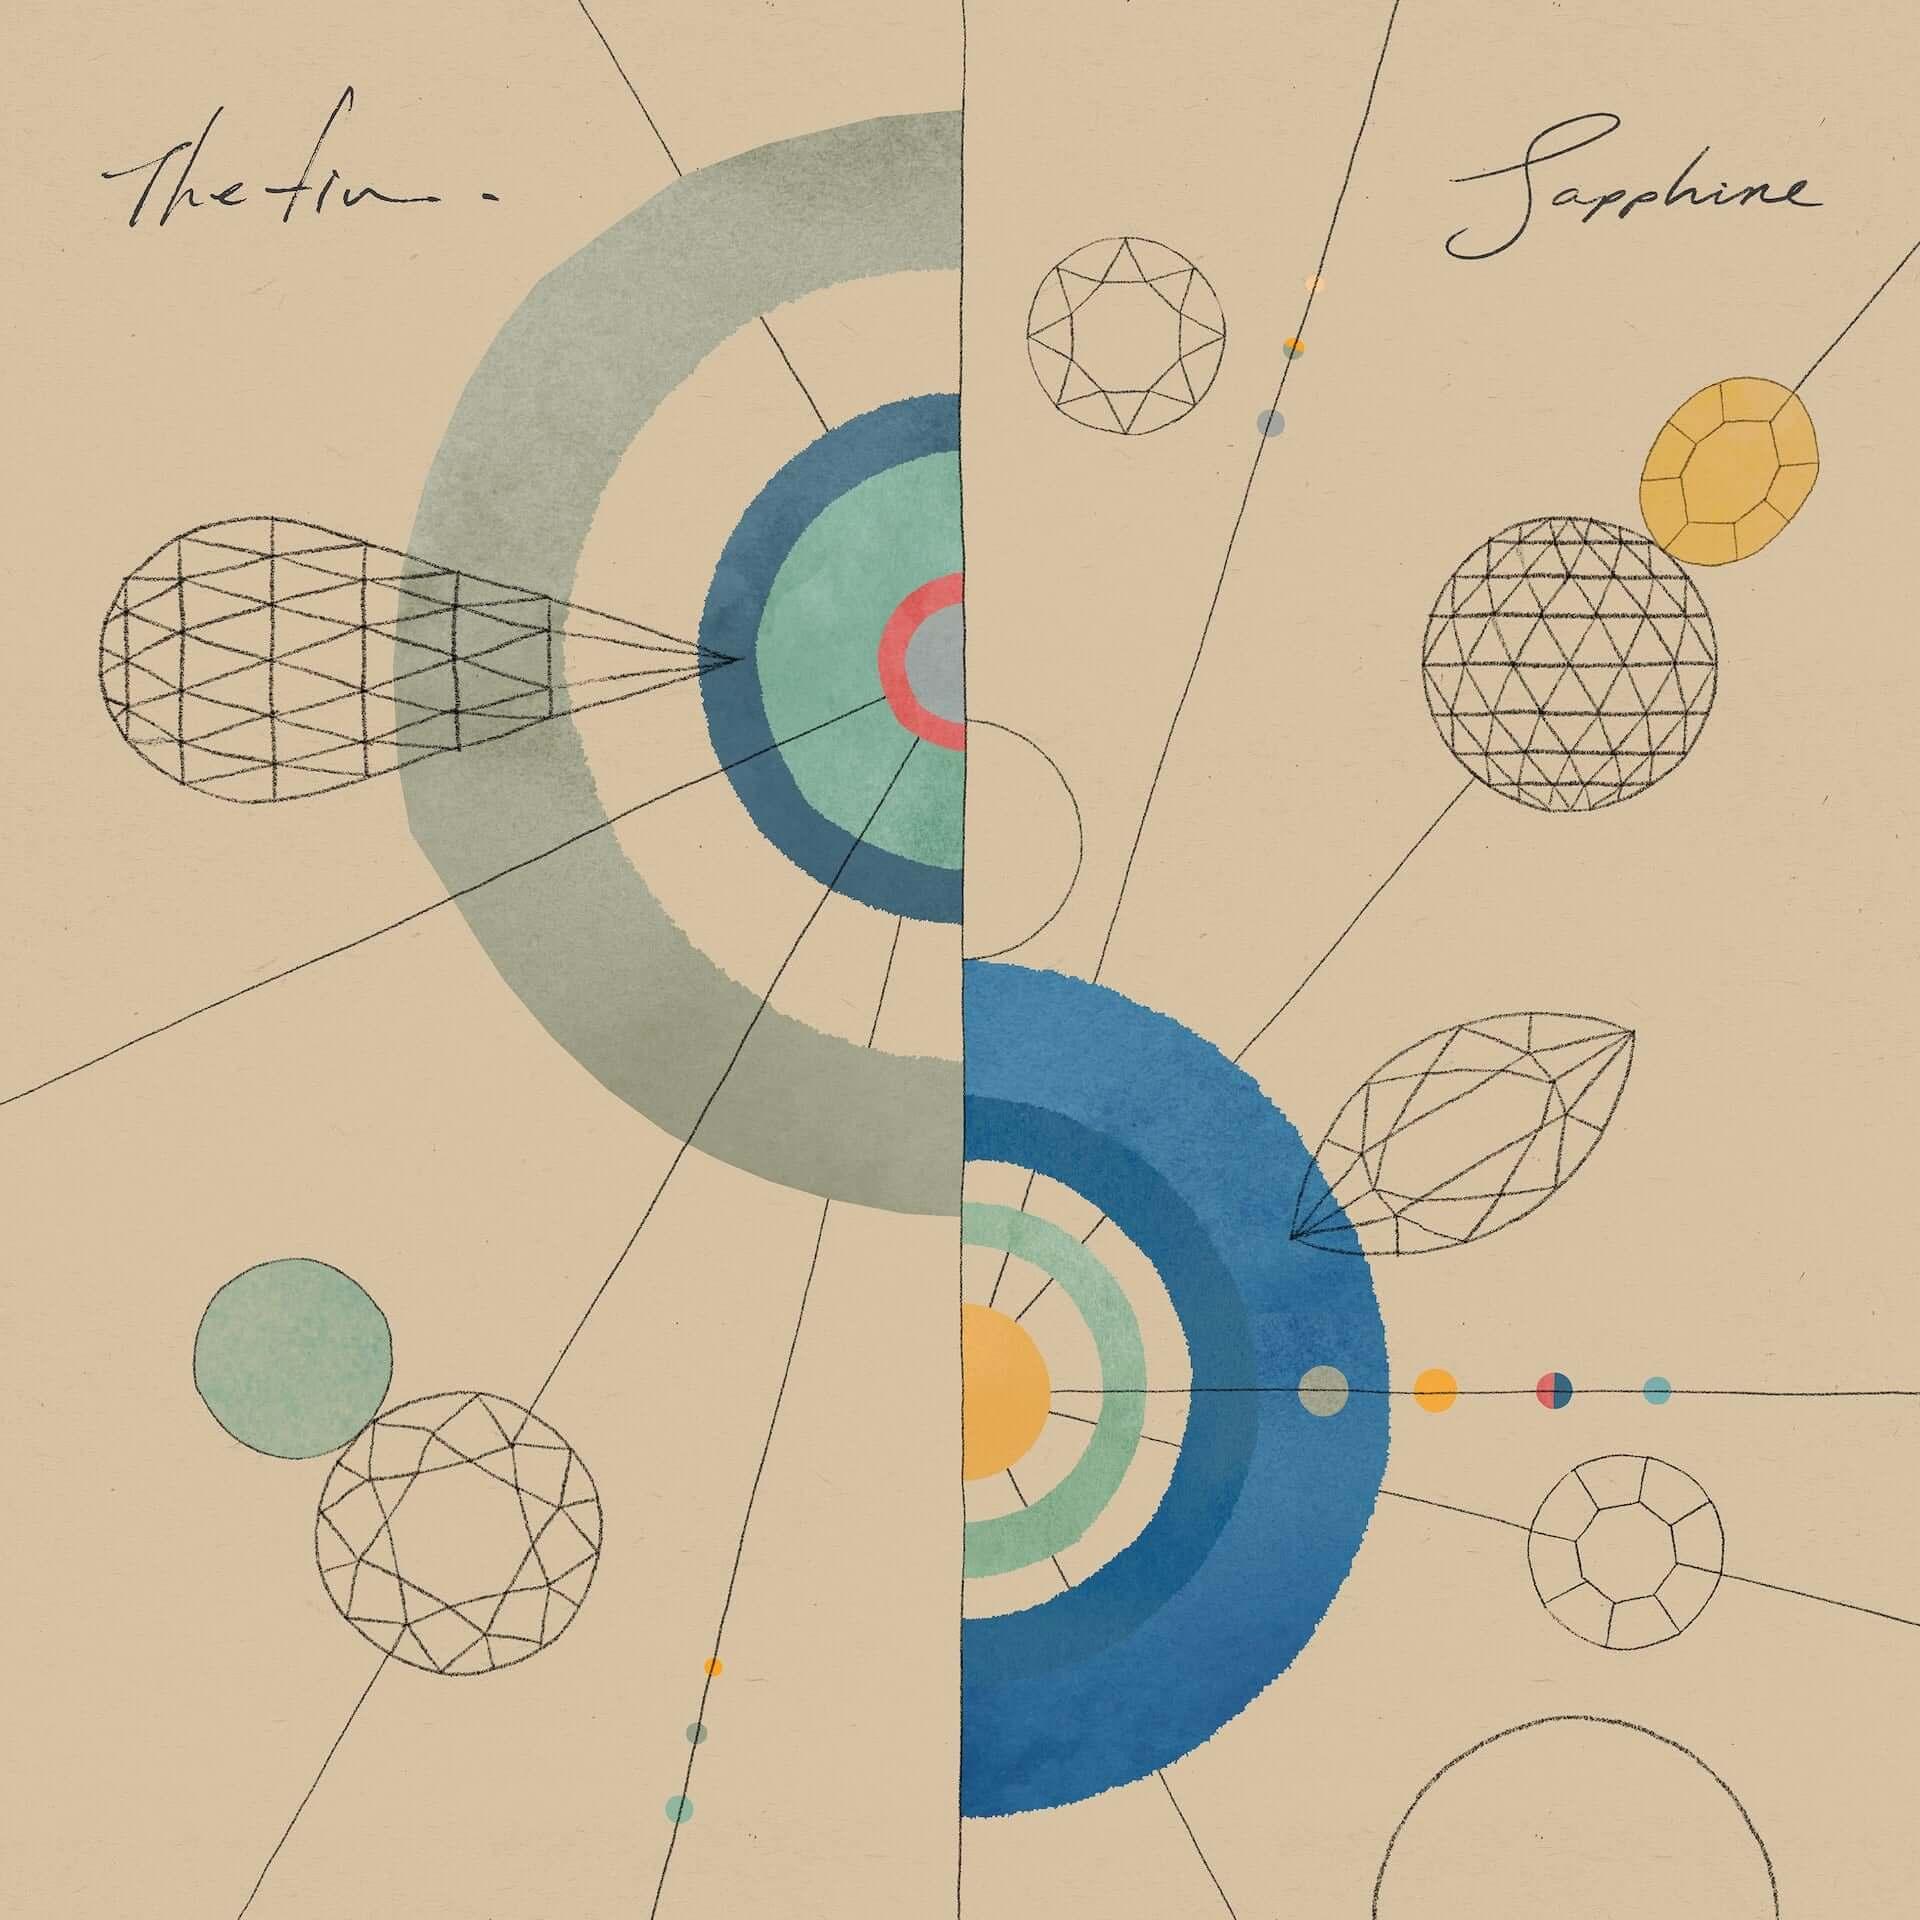 "The fin.の新曲""Sapphire""が本日リリース&リリックビデオも公開!オンラインライブ<#thefin_05>にはFunny Facturesが出演決定 music201127_thefin_3-1920x1920"